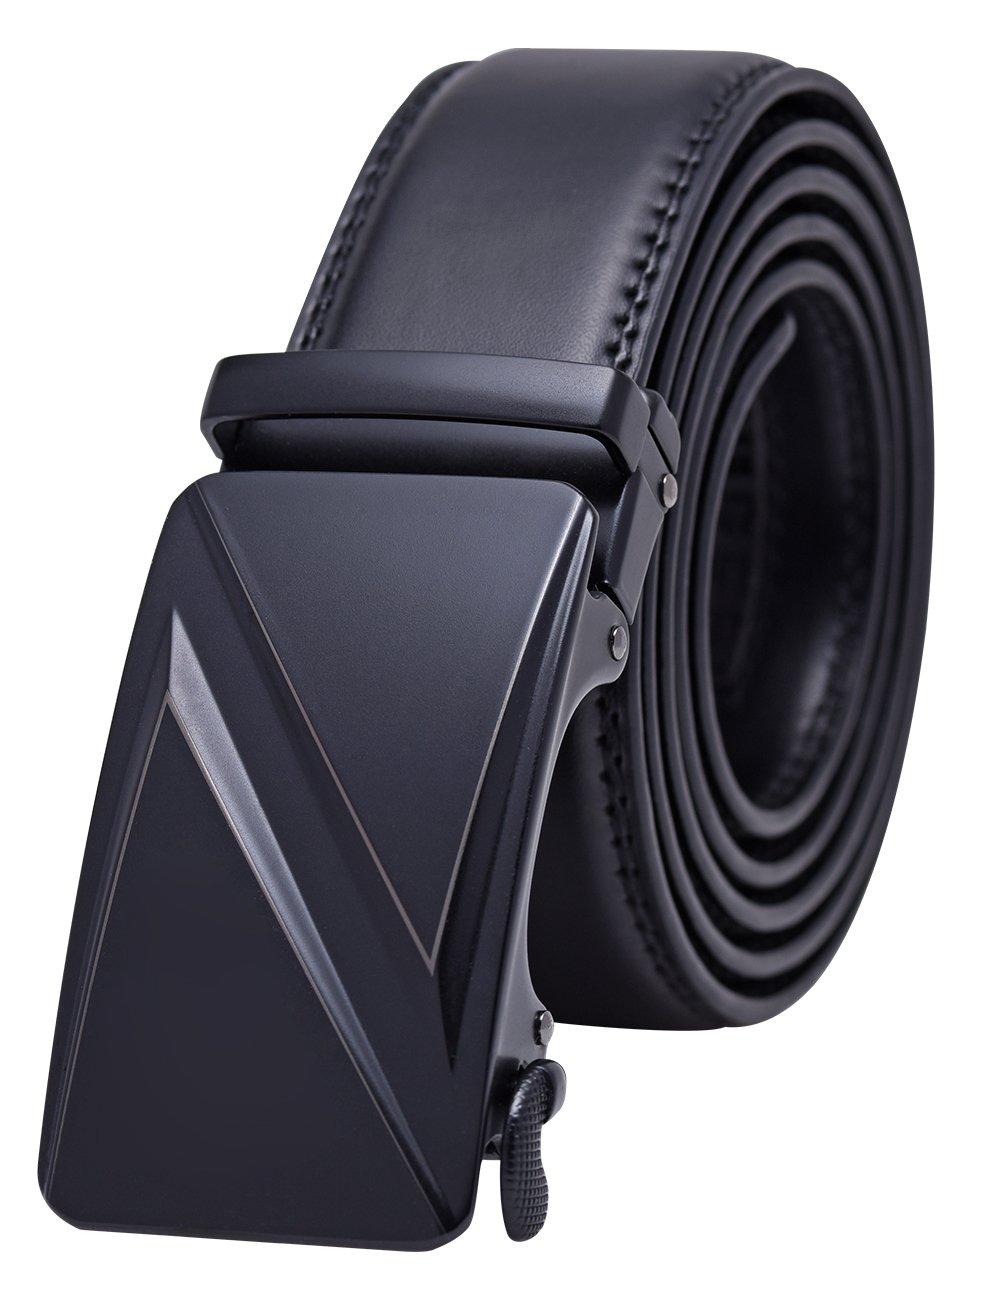 YoMeiJun Men's Leather Belt Automatic Chrom Buckle Black 35mm Z-XL